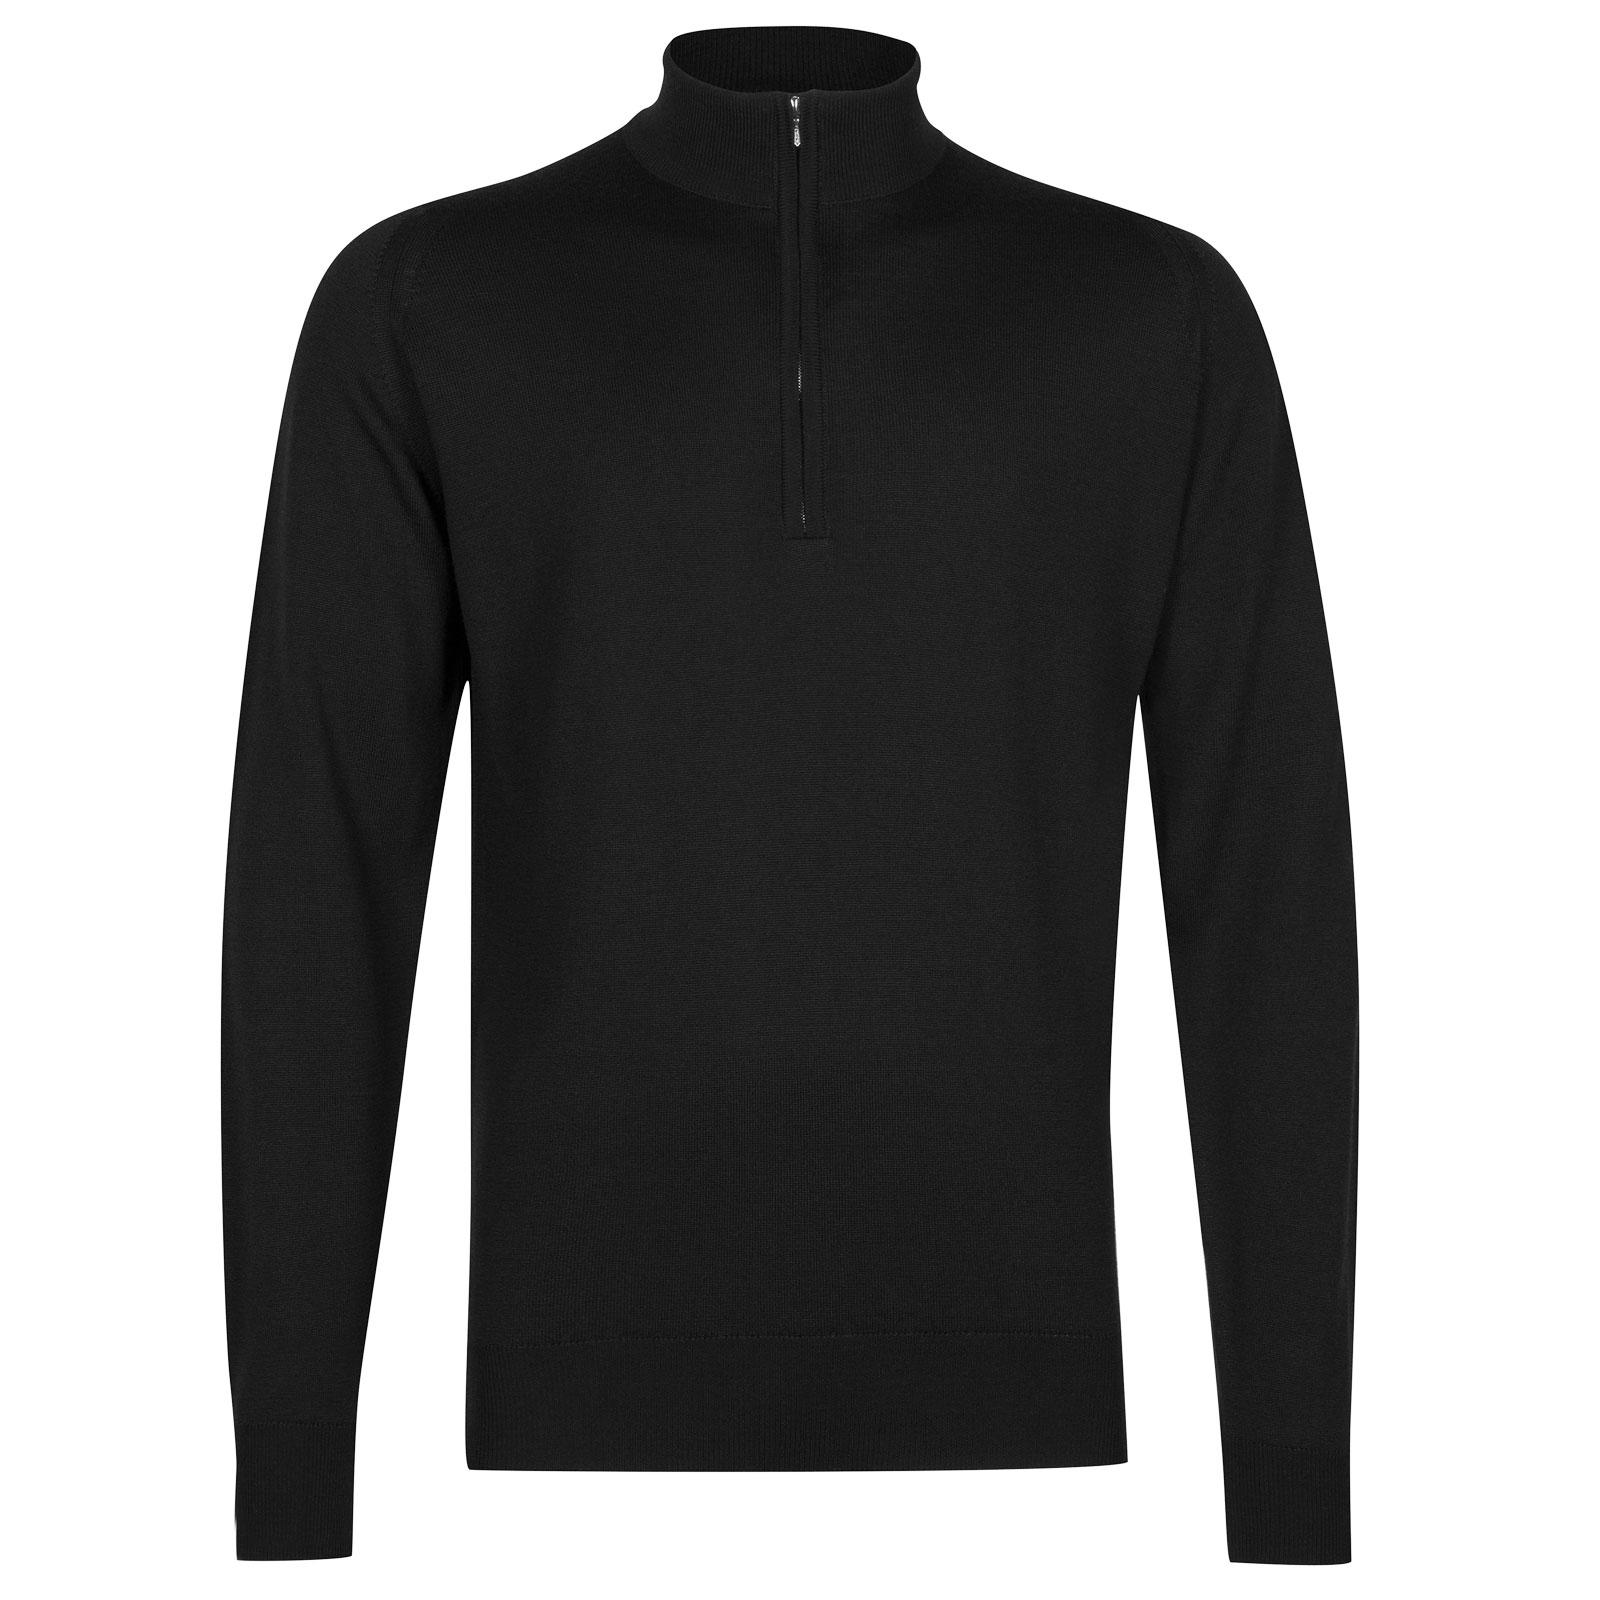 John Smedley tapton Merino Wool Pullover in Black-L